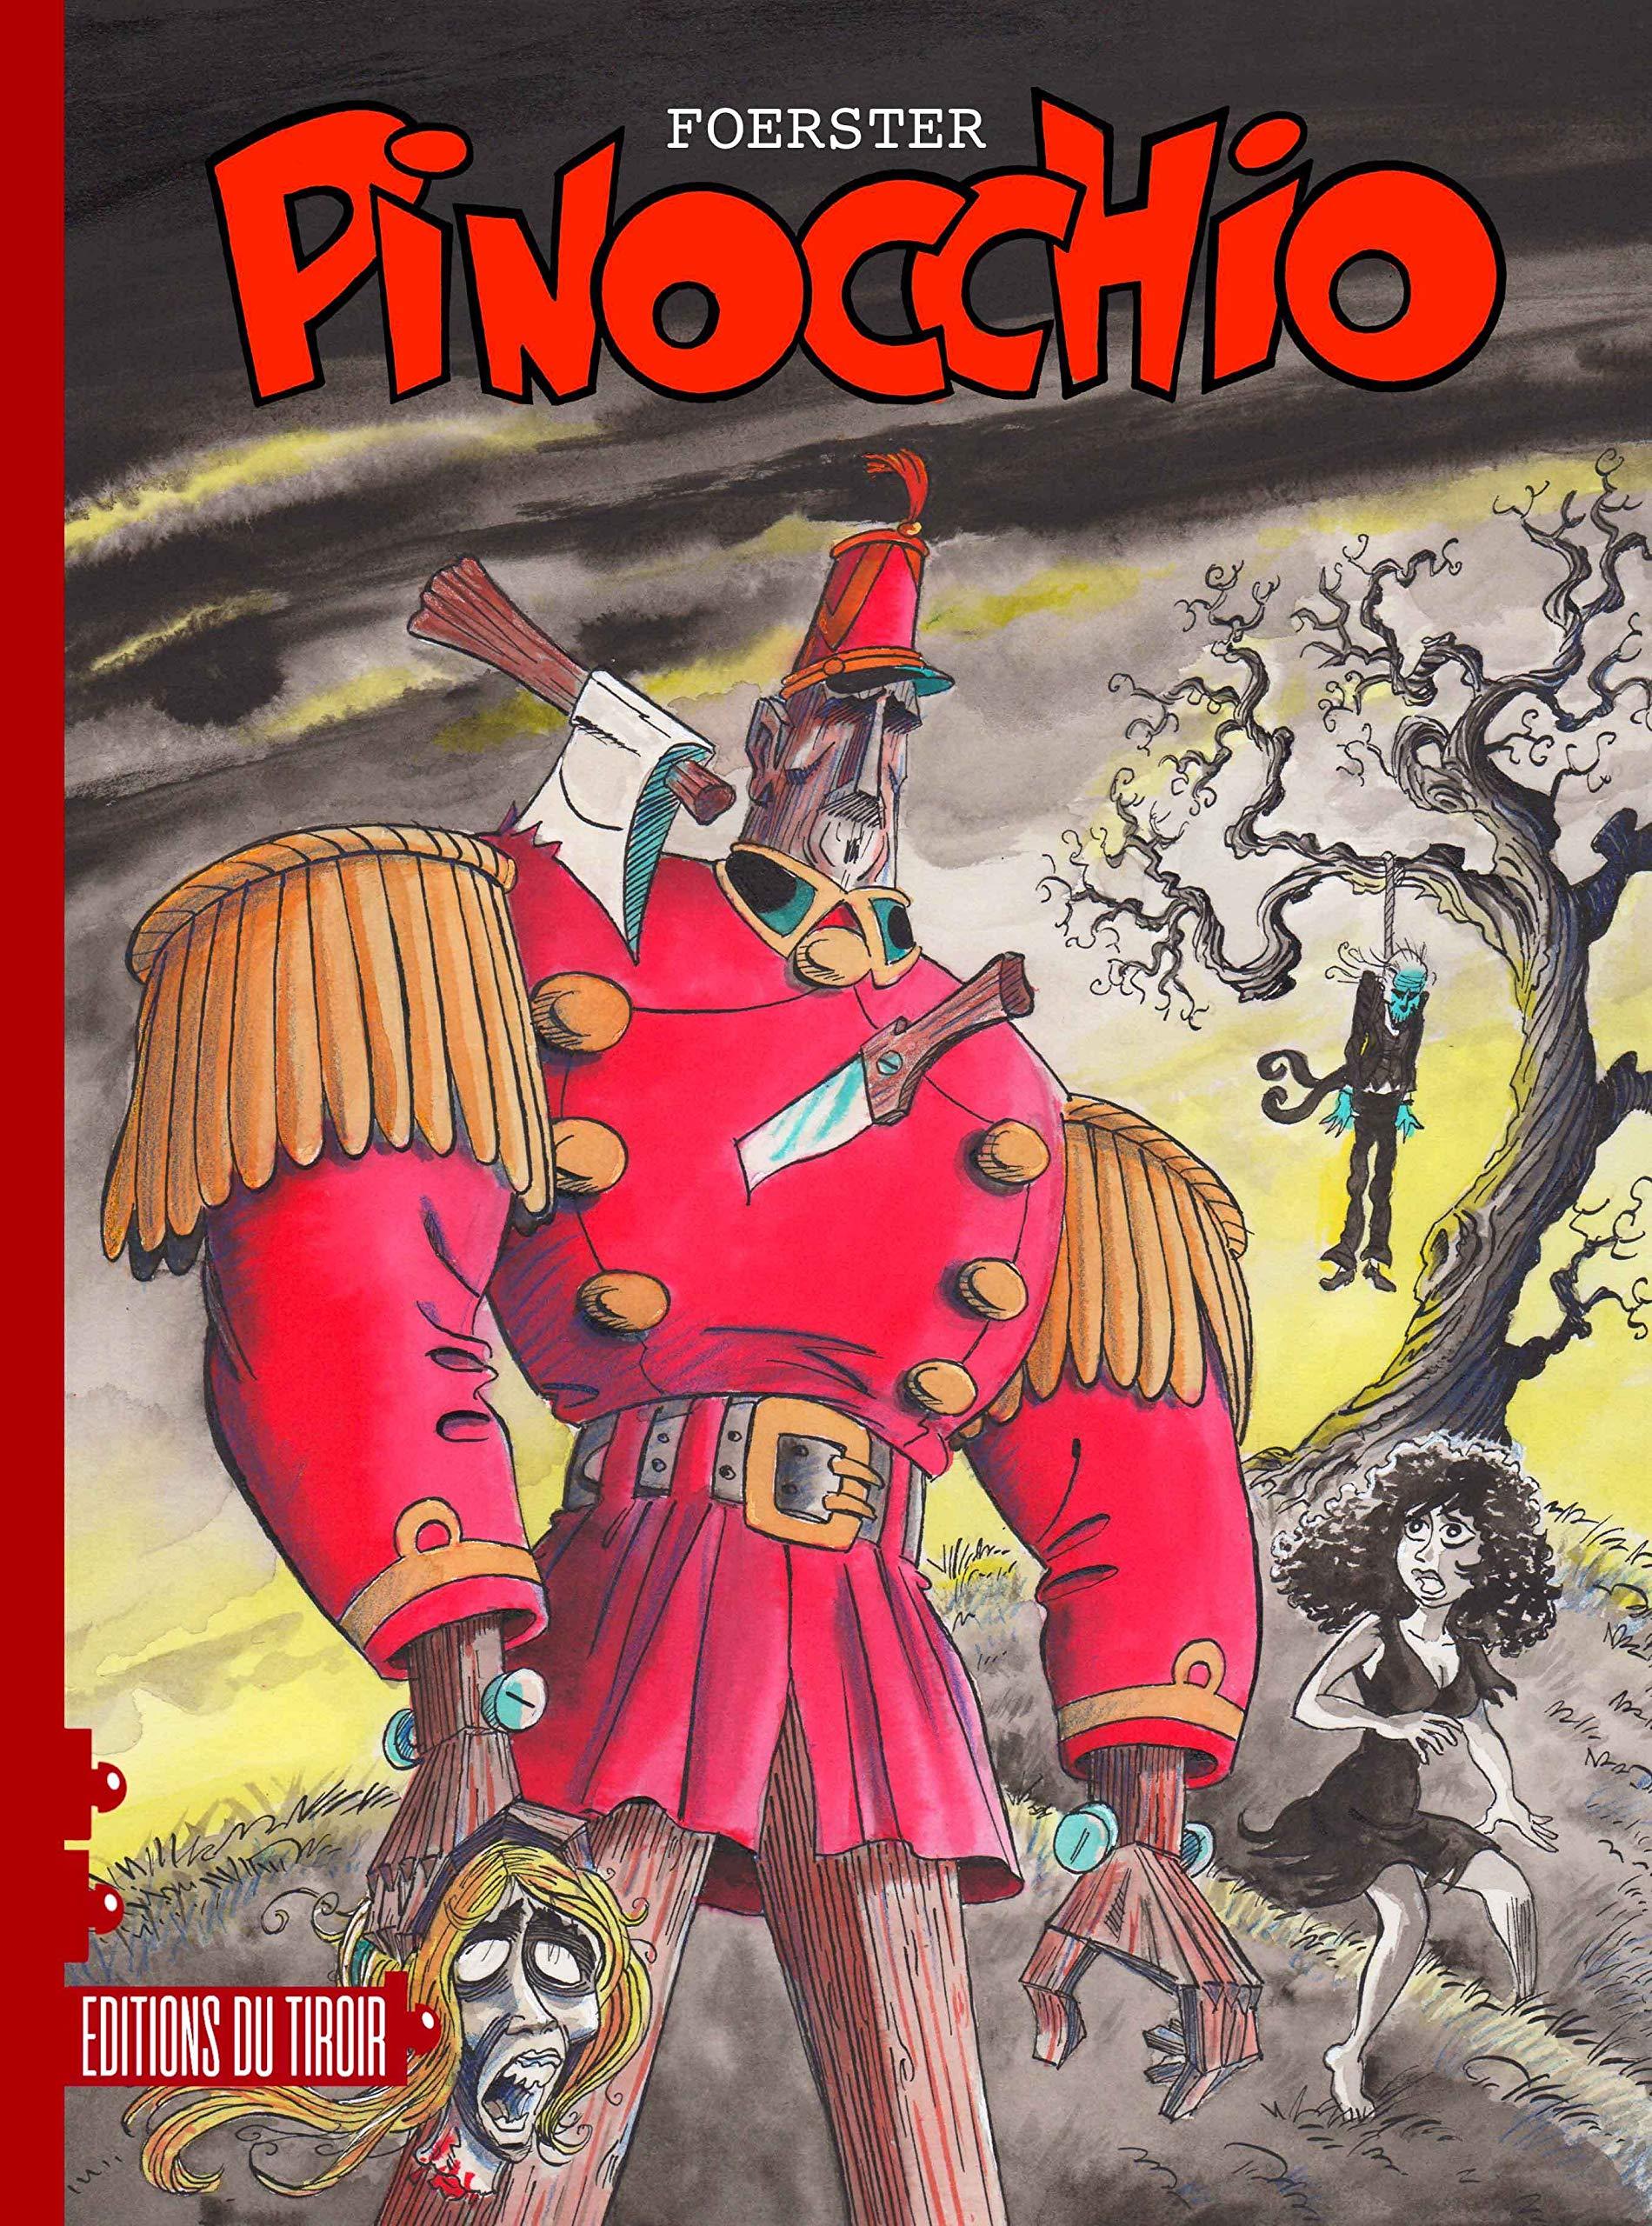 Pinocchio (Foerster) 1 - Pinocchio